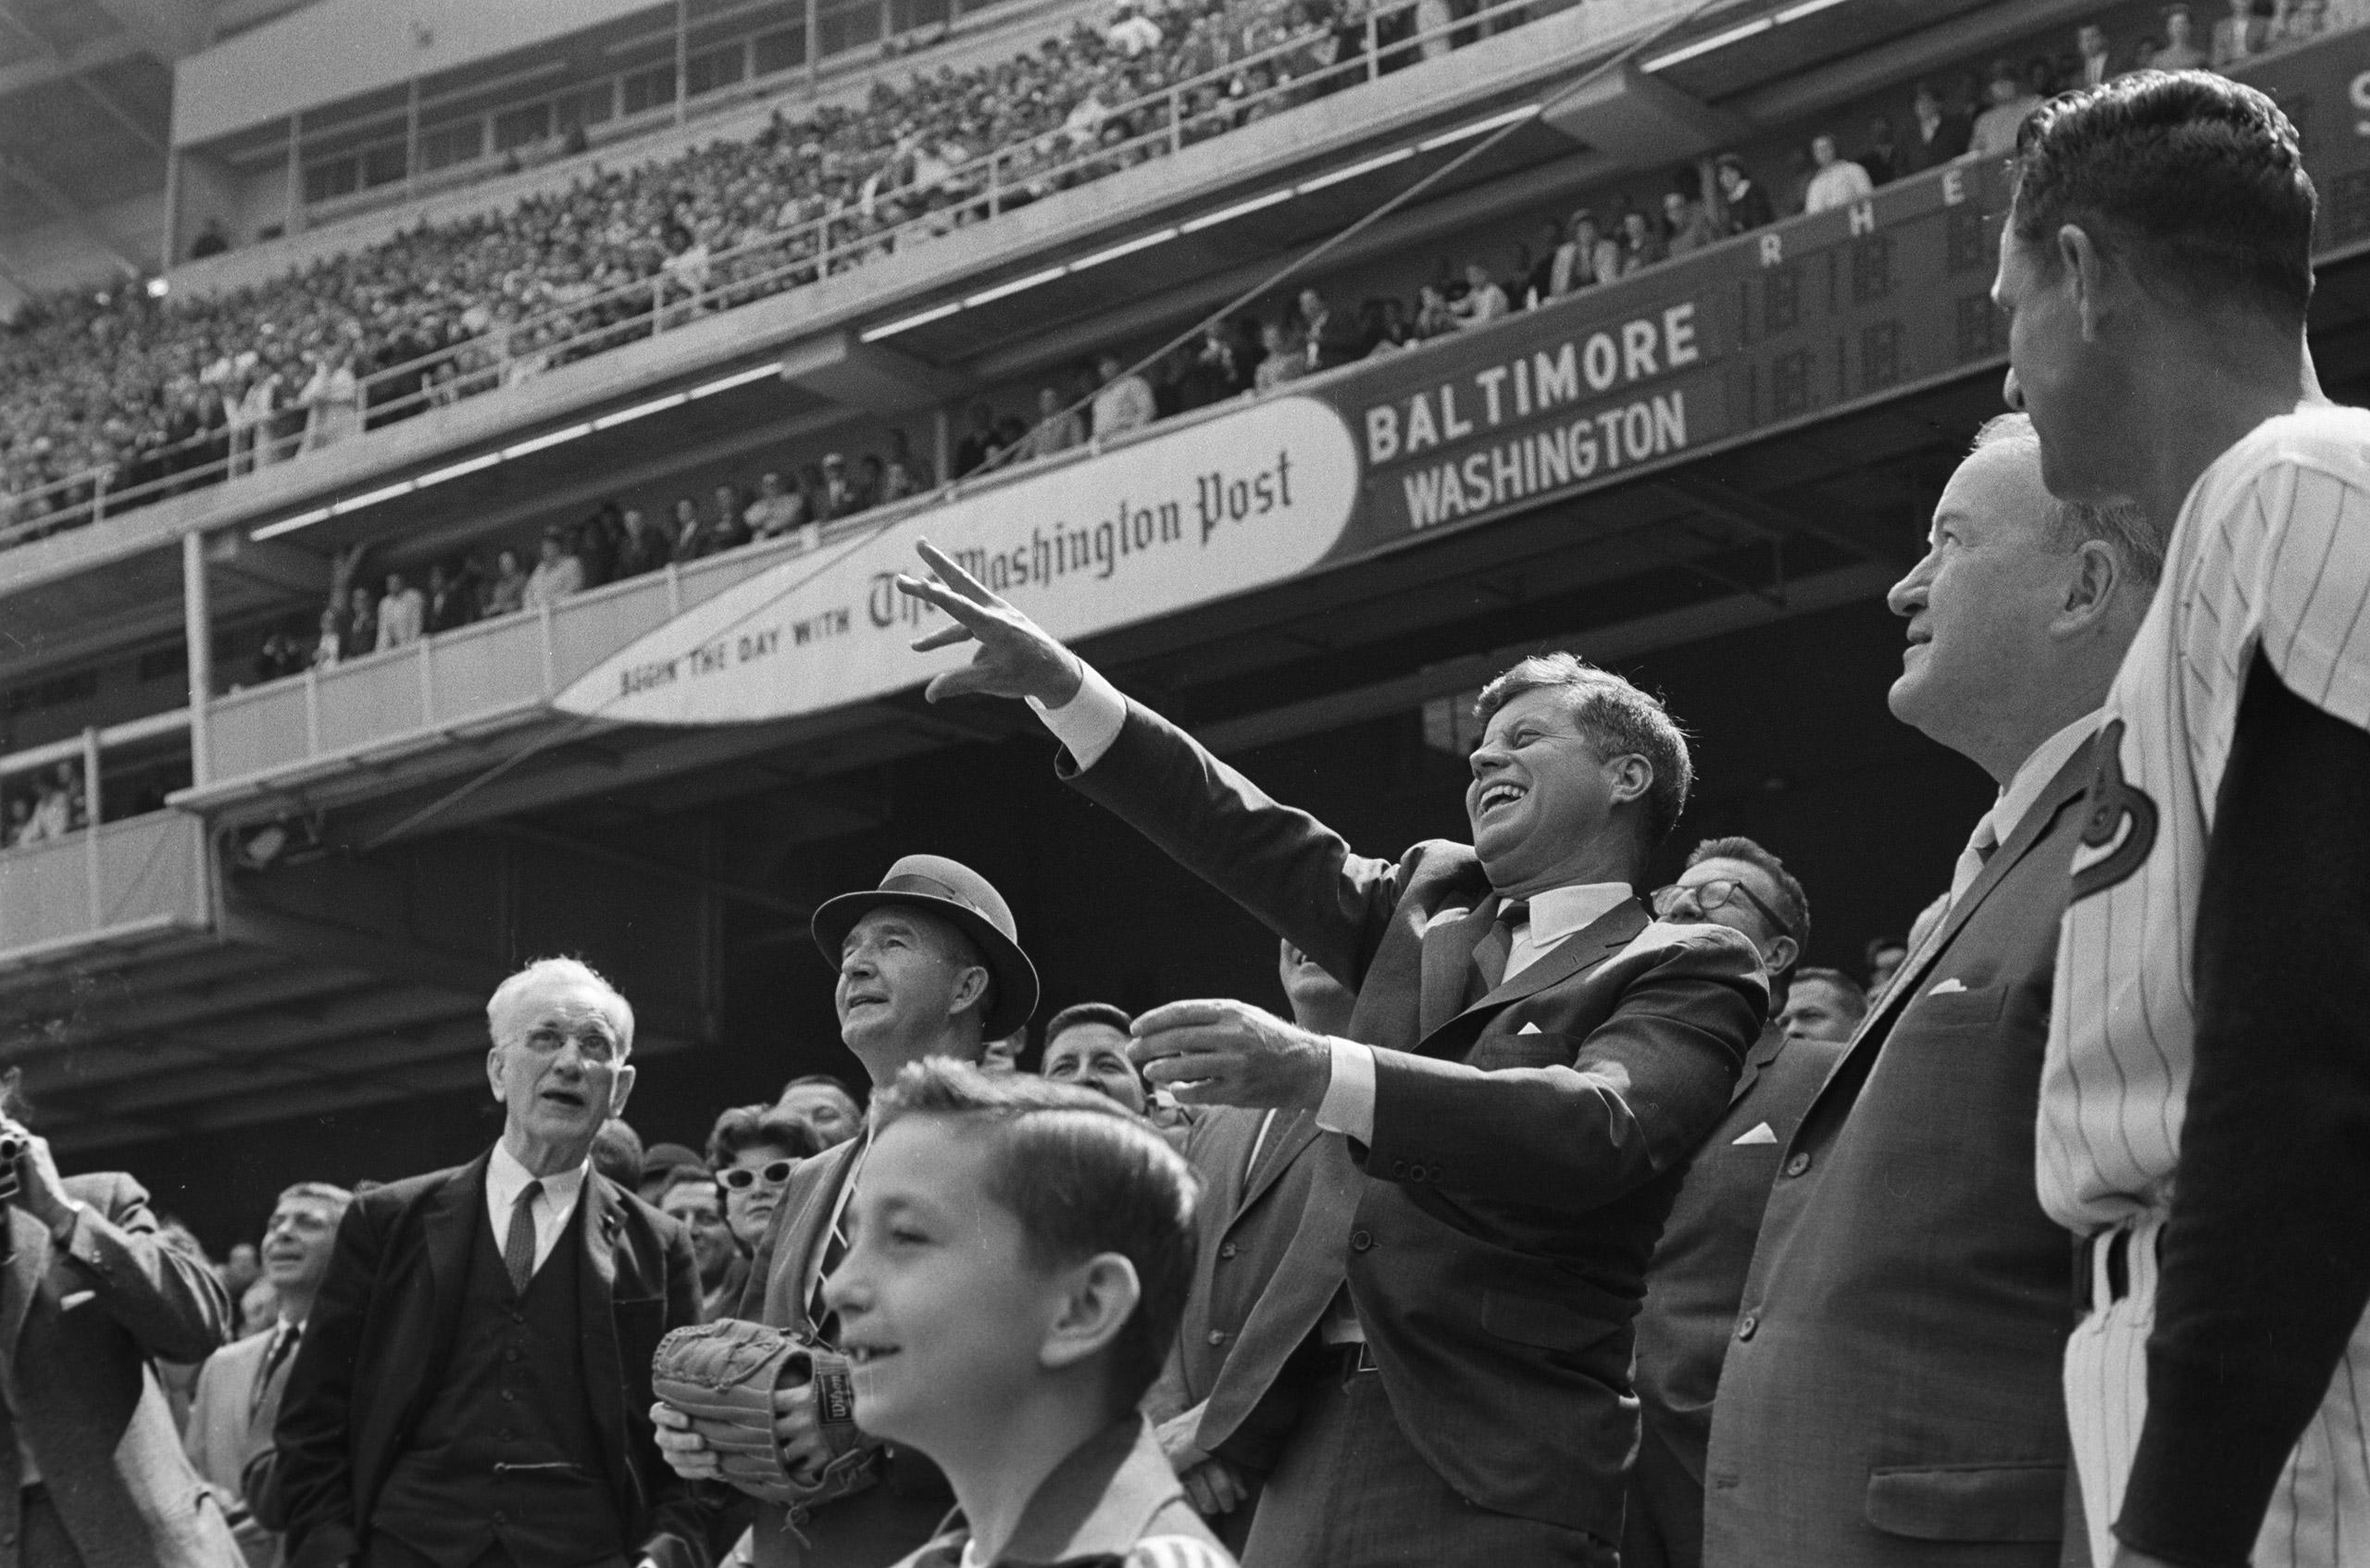 John F. Kennedy at a baseball game.